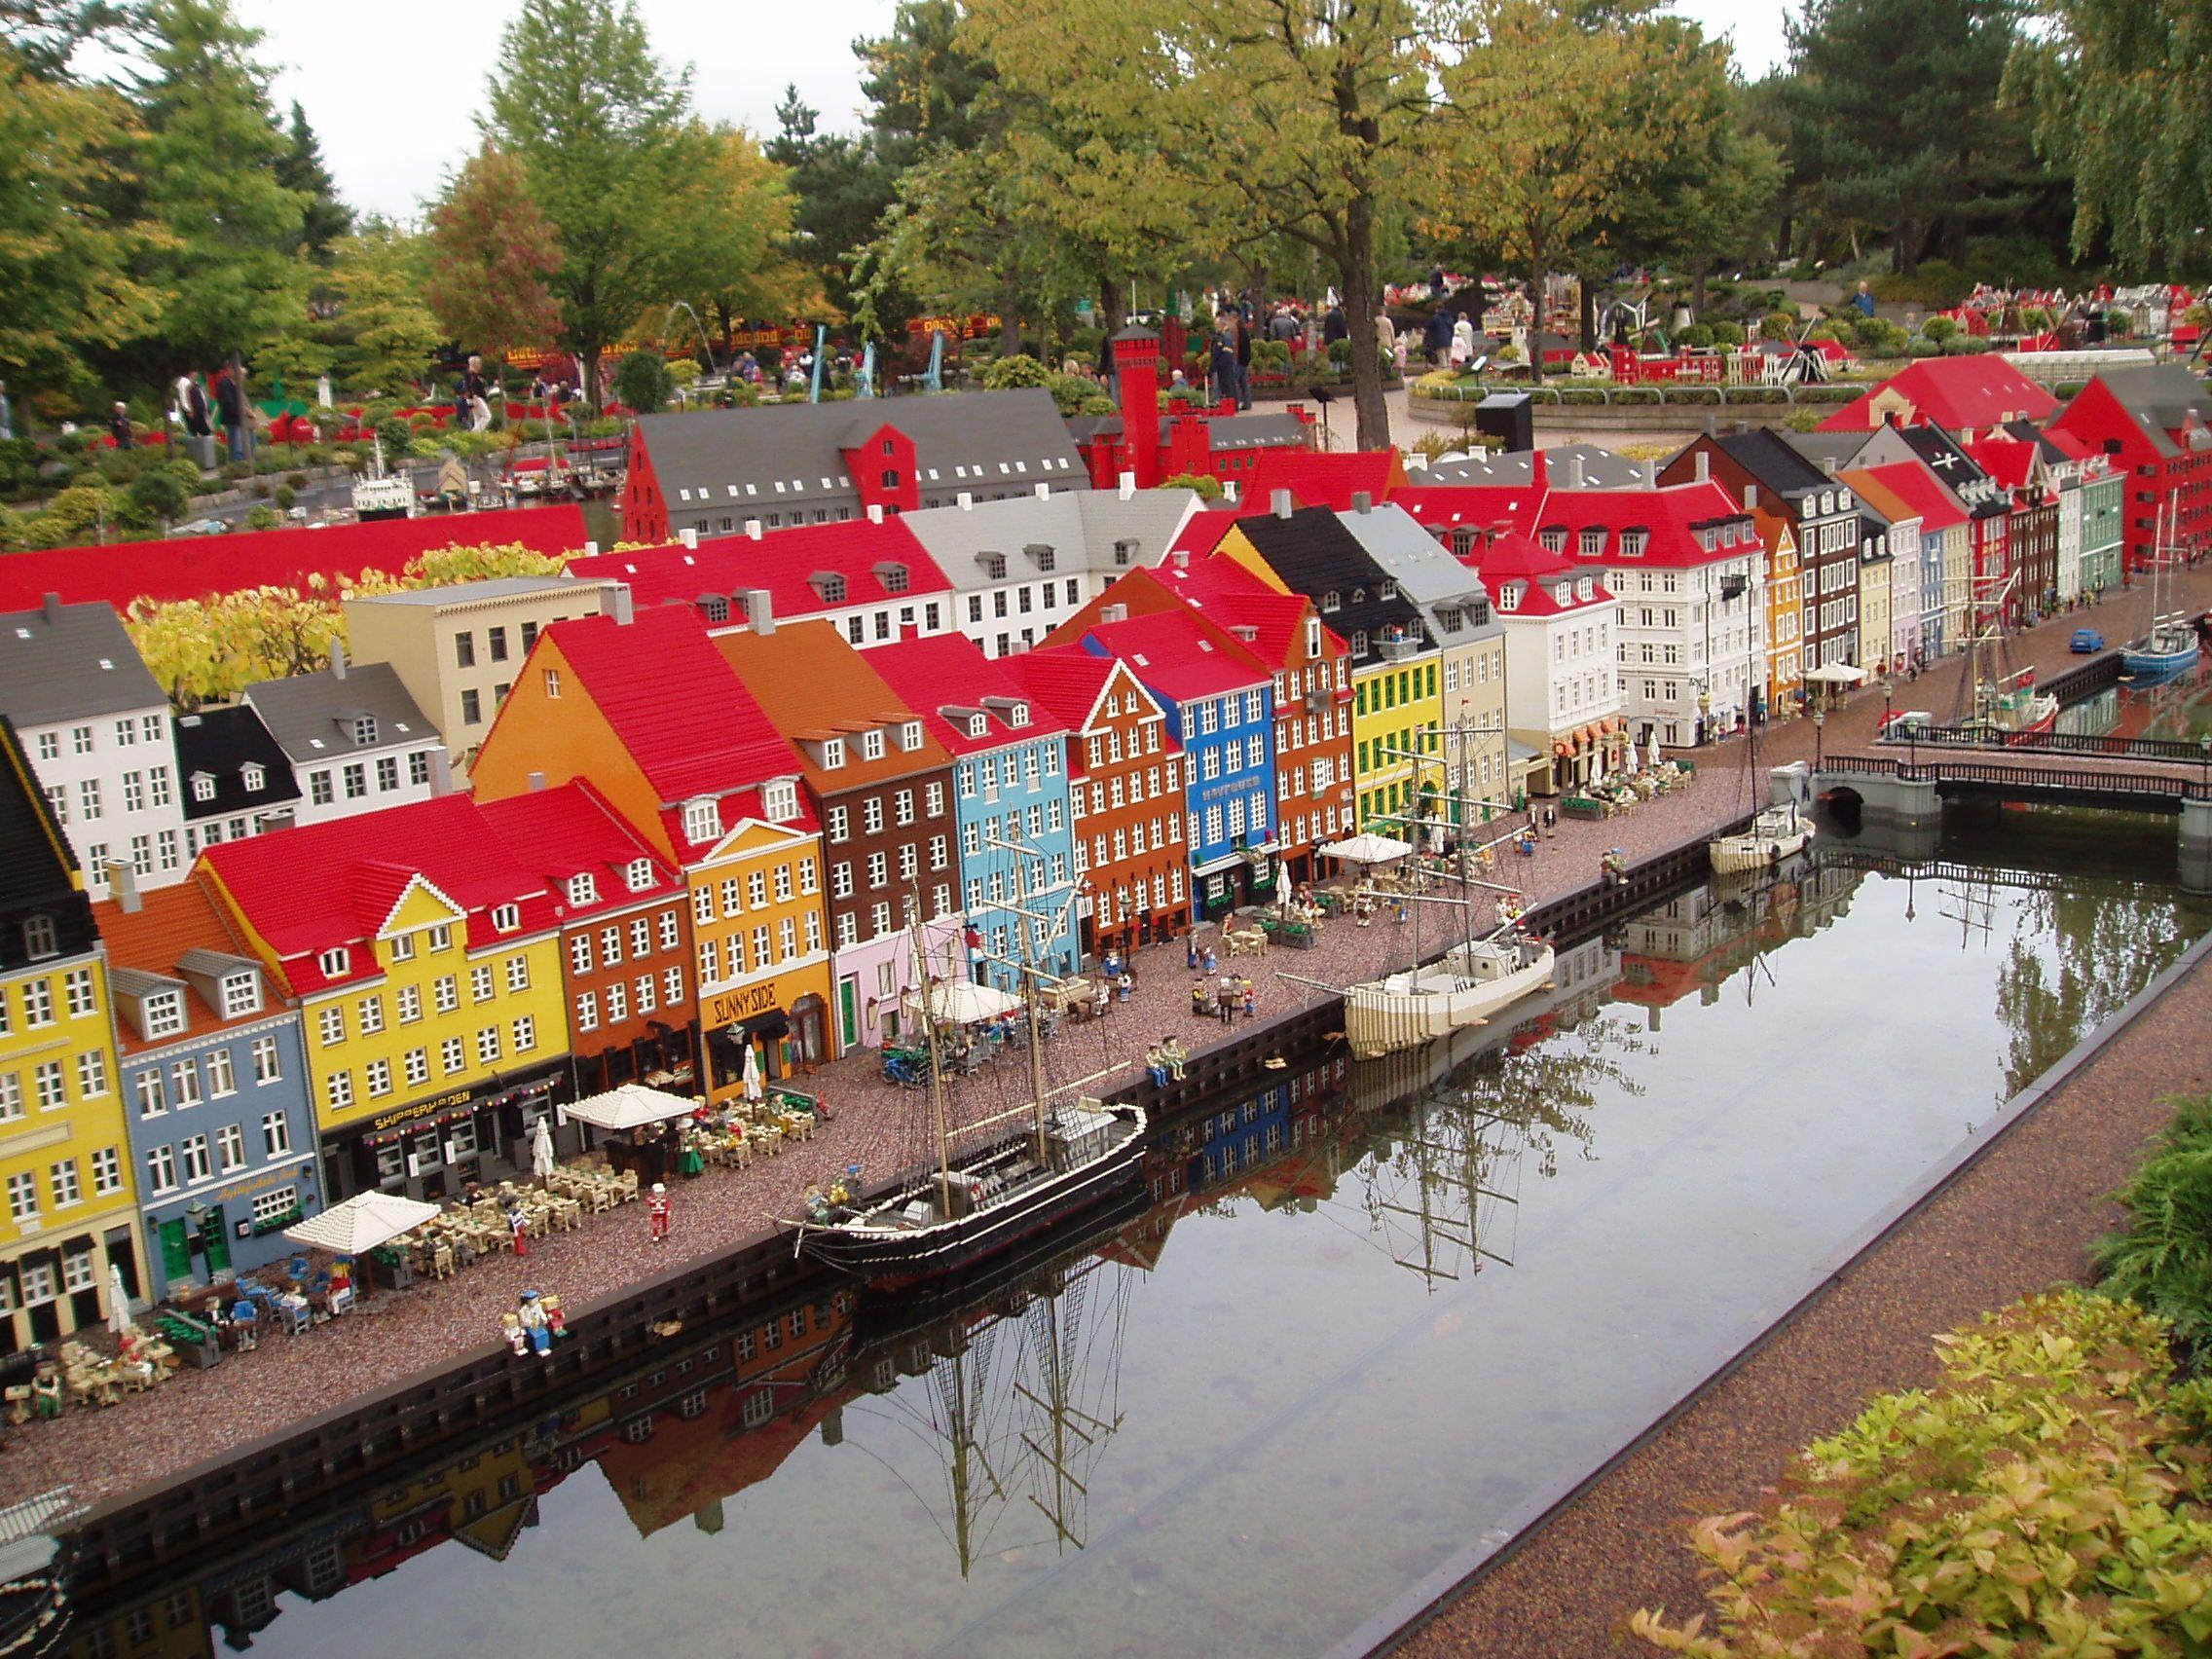 Lego Nyhavn Legoland Billund Denmark Cool Places To Visit Places To Visit Legoland